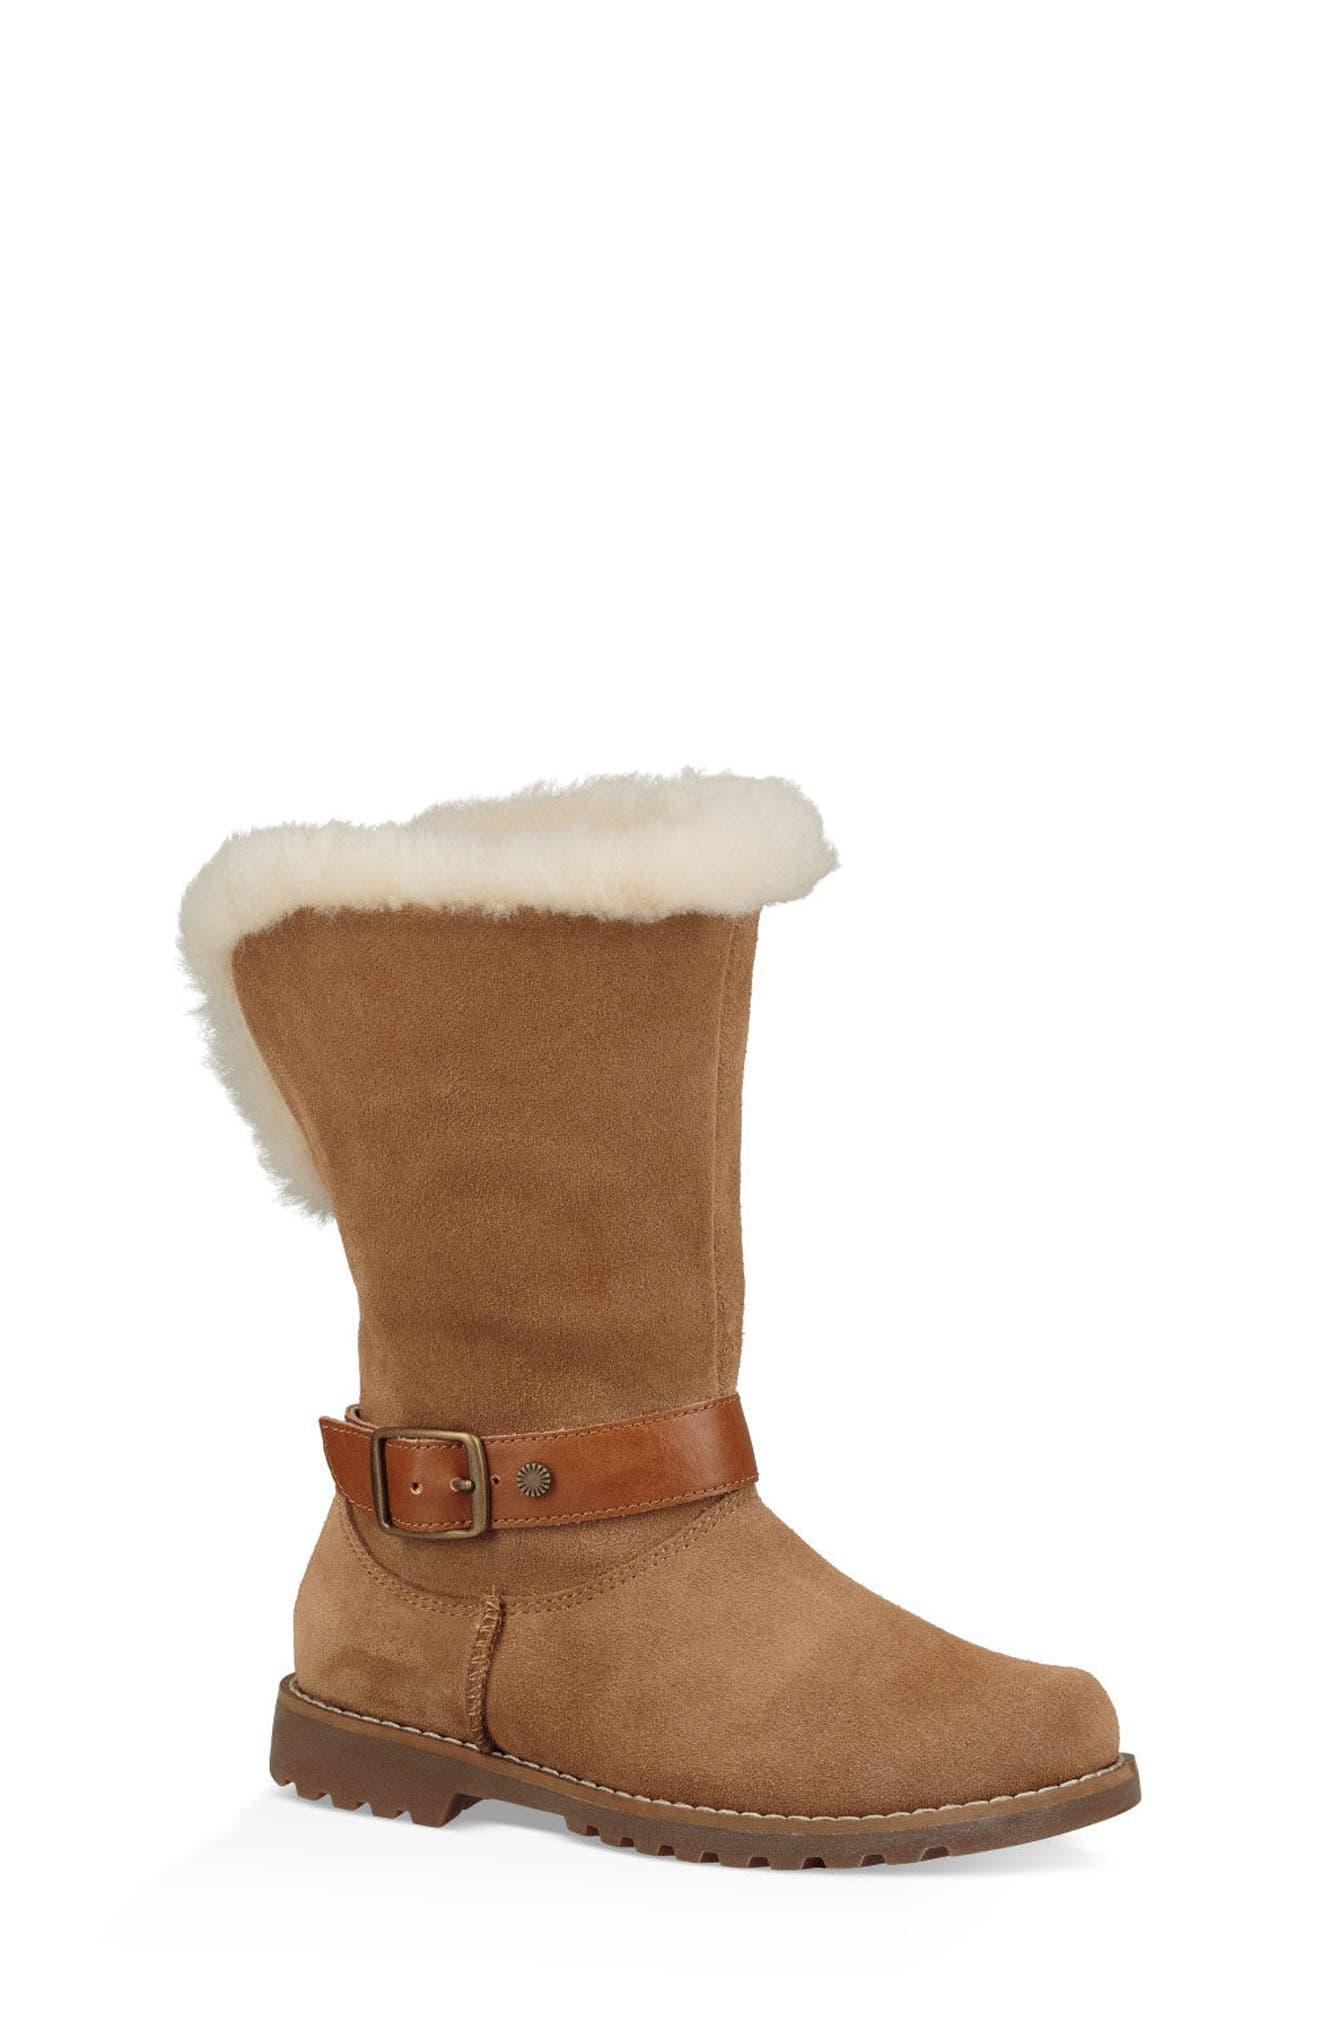 UGG® Nessa Genuine Shearling Boot (Walker, Toddler, Little Kid & Big Kid)